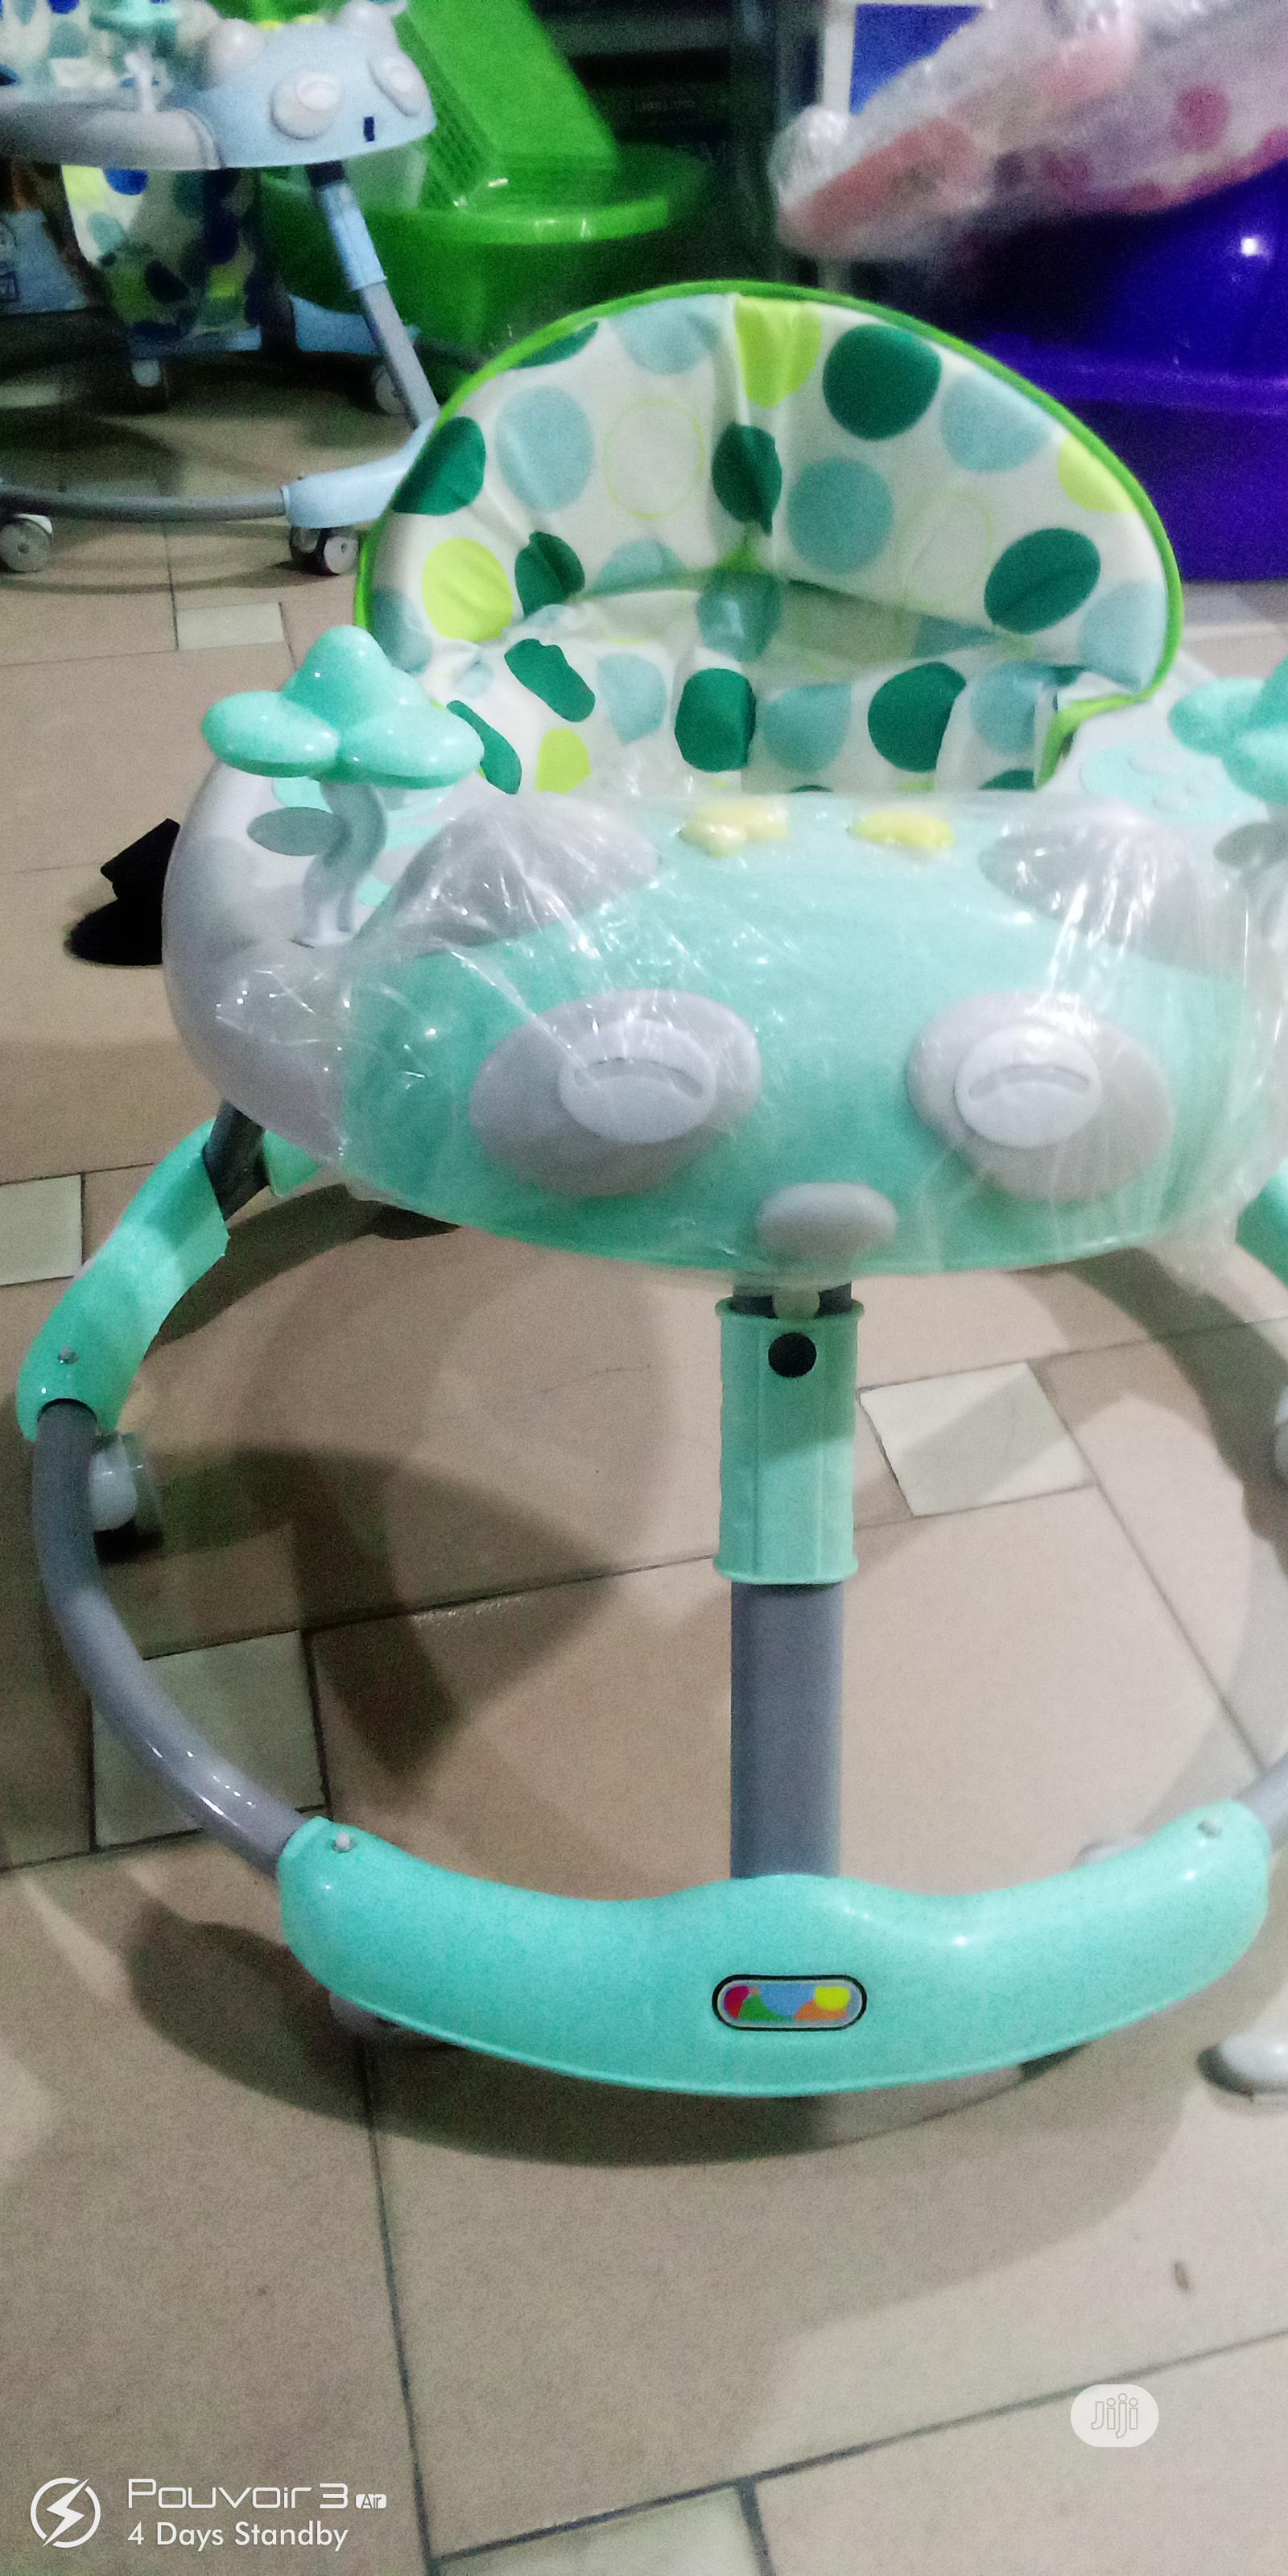 Baby Walker | Children's Gear & Safety for sale in Gbagada, Lagos State, Nigeria